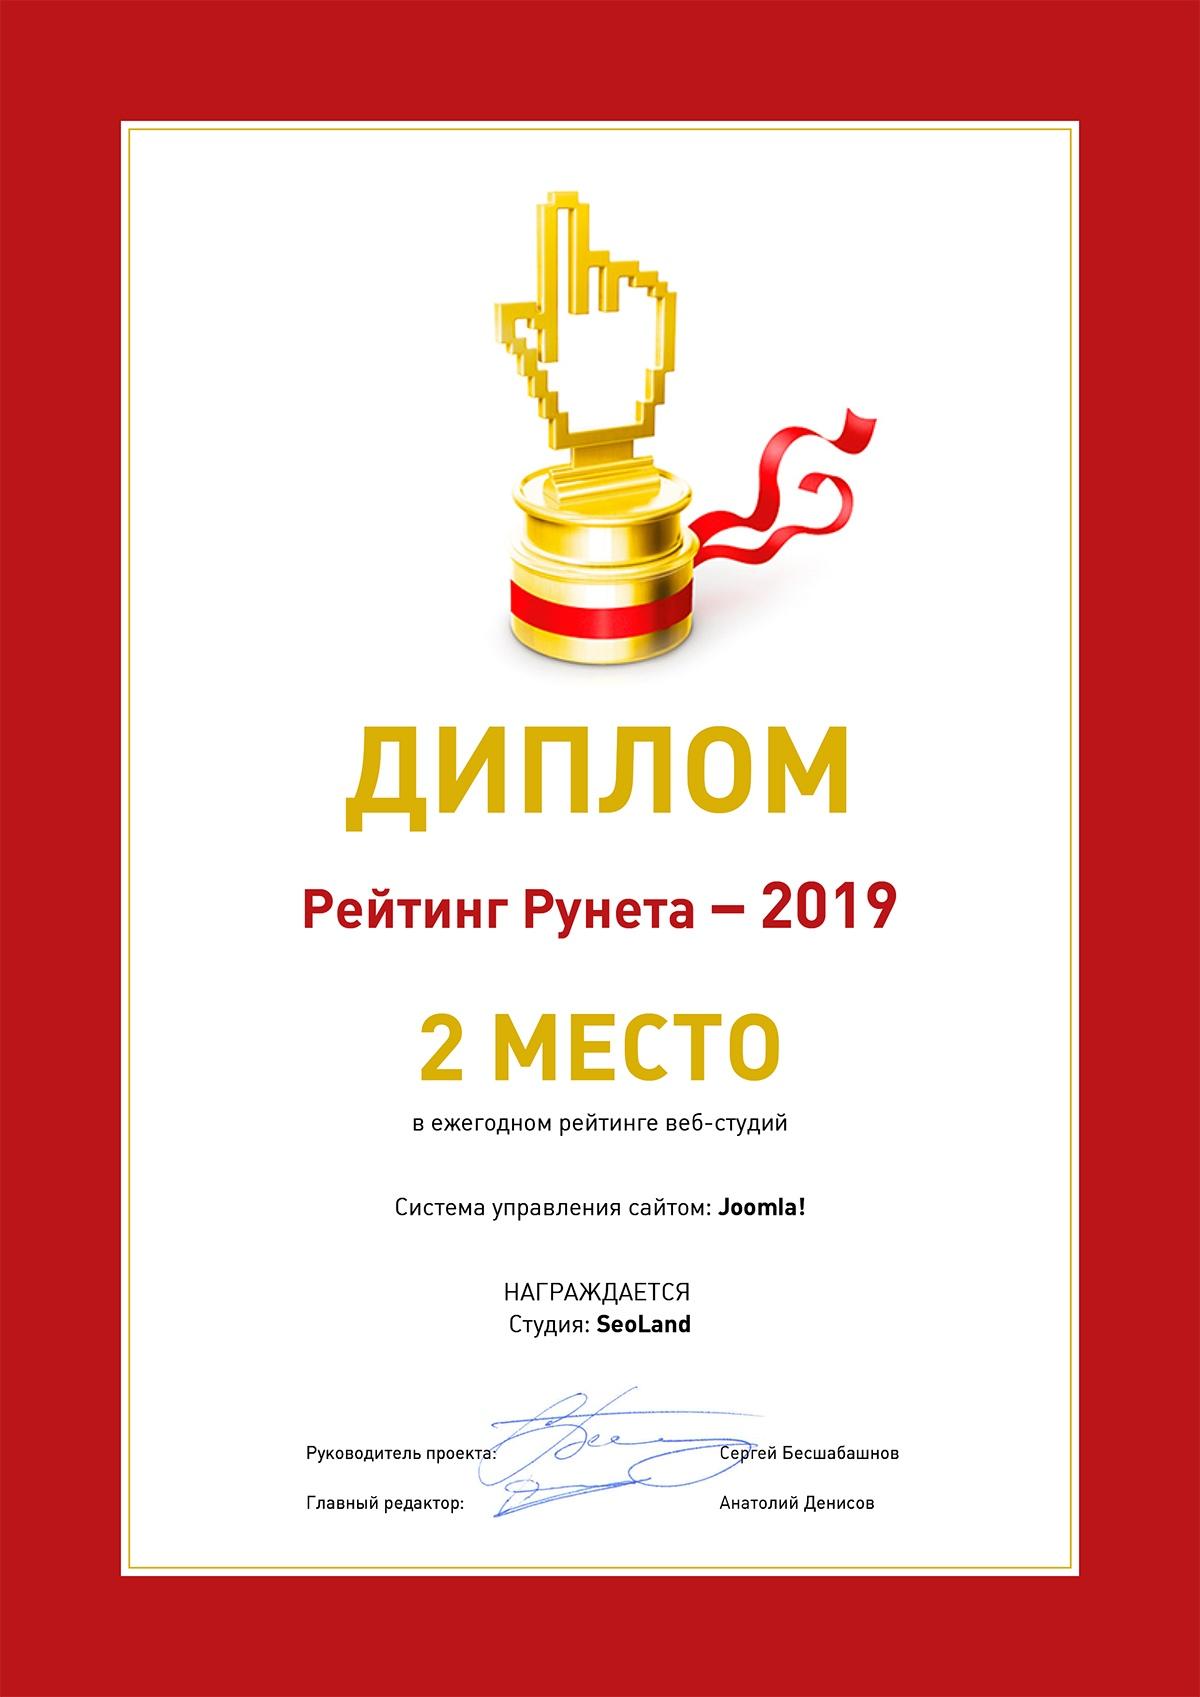 Компания SeoLand заняла 2 место в России среди разработчиков сайтов.